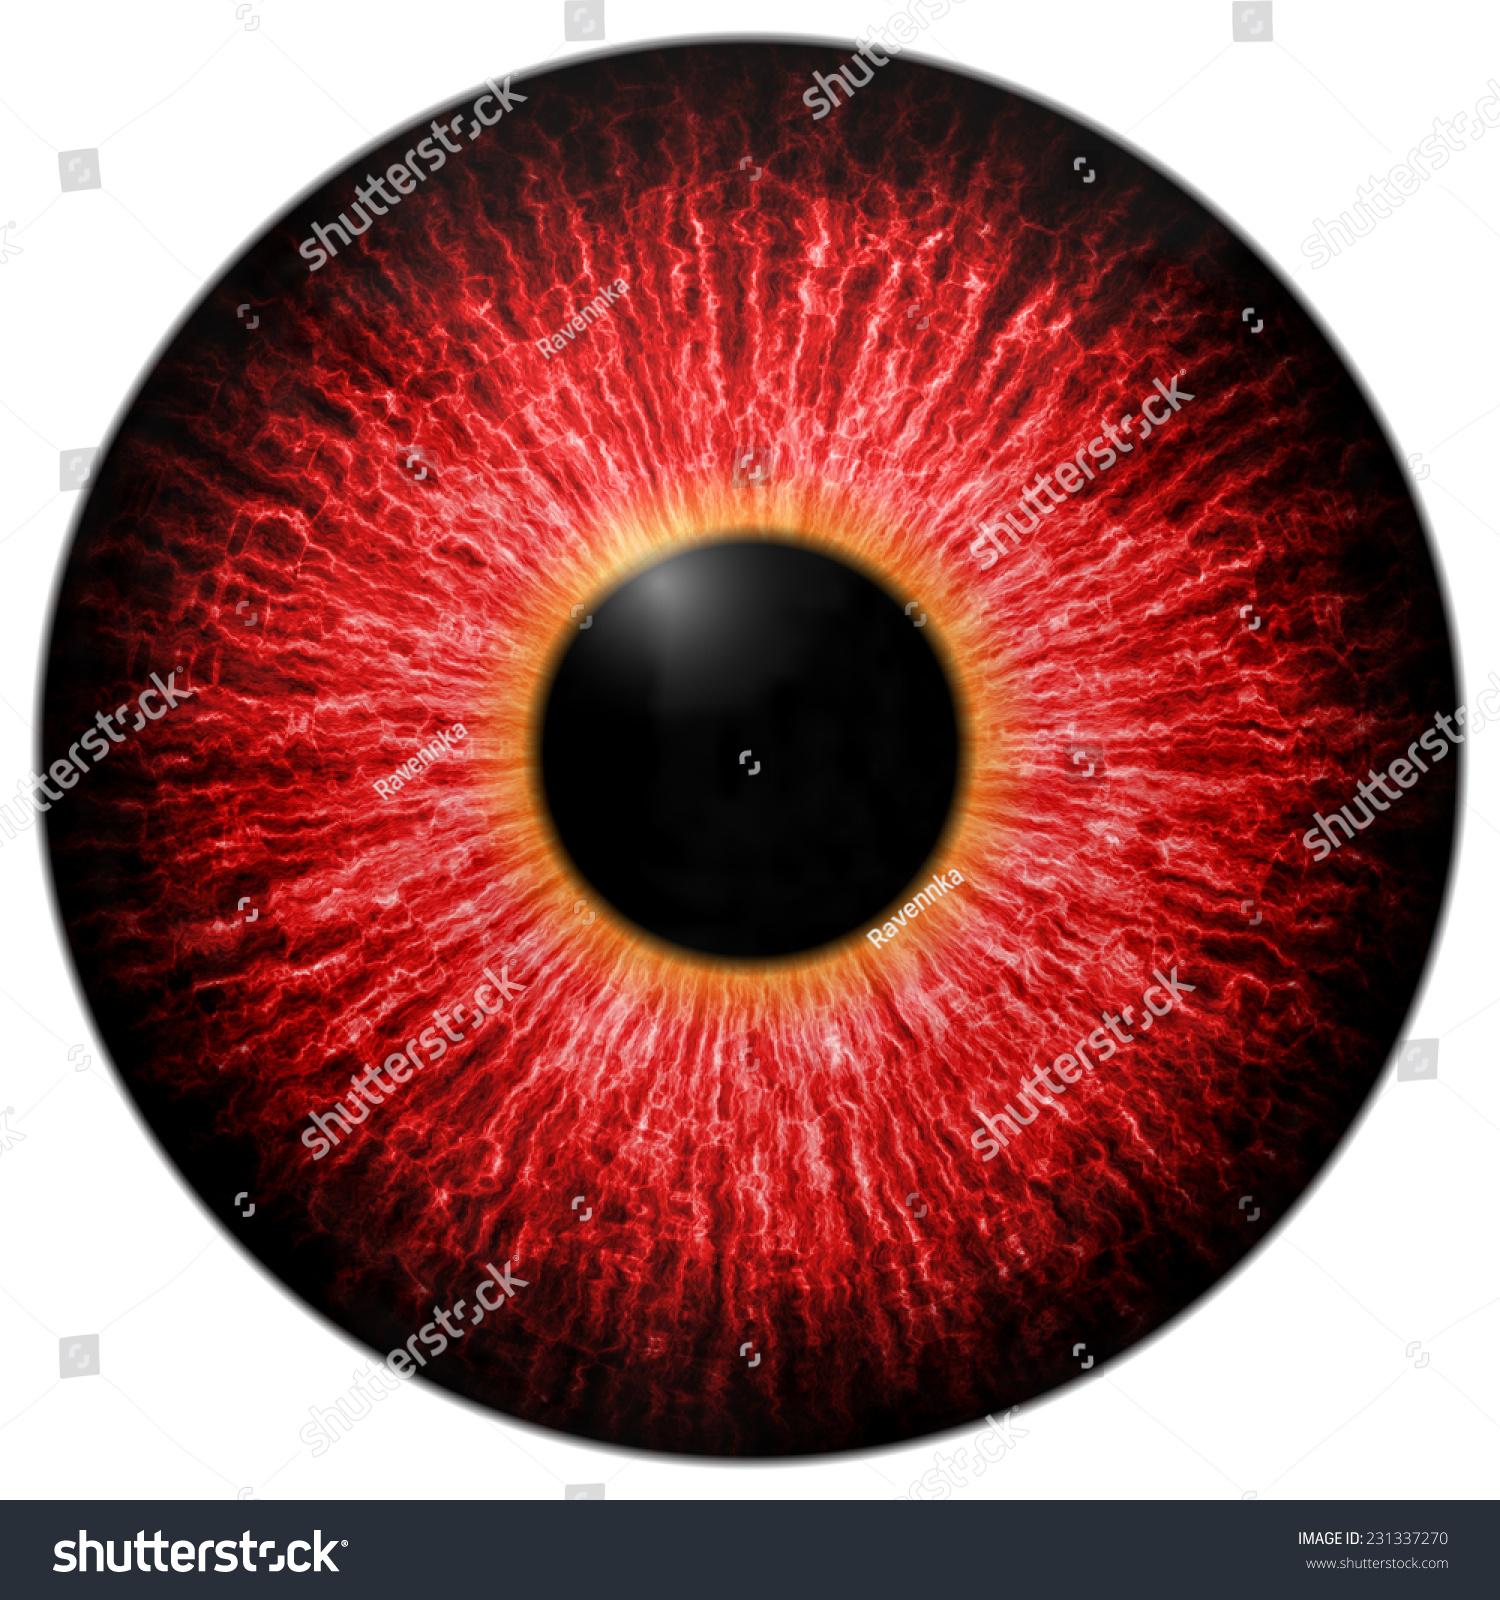 scary eyes Illustration of red scary eye isolated on white